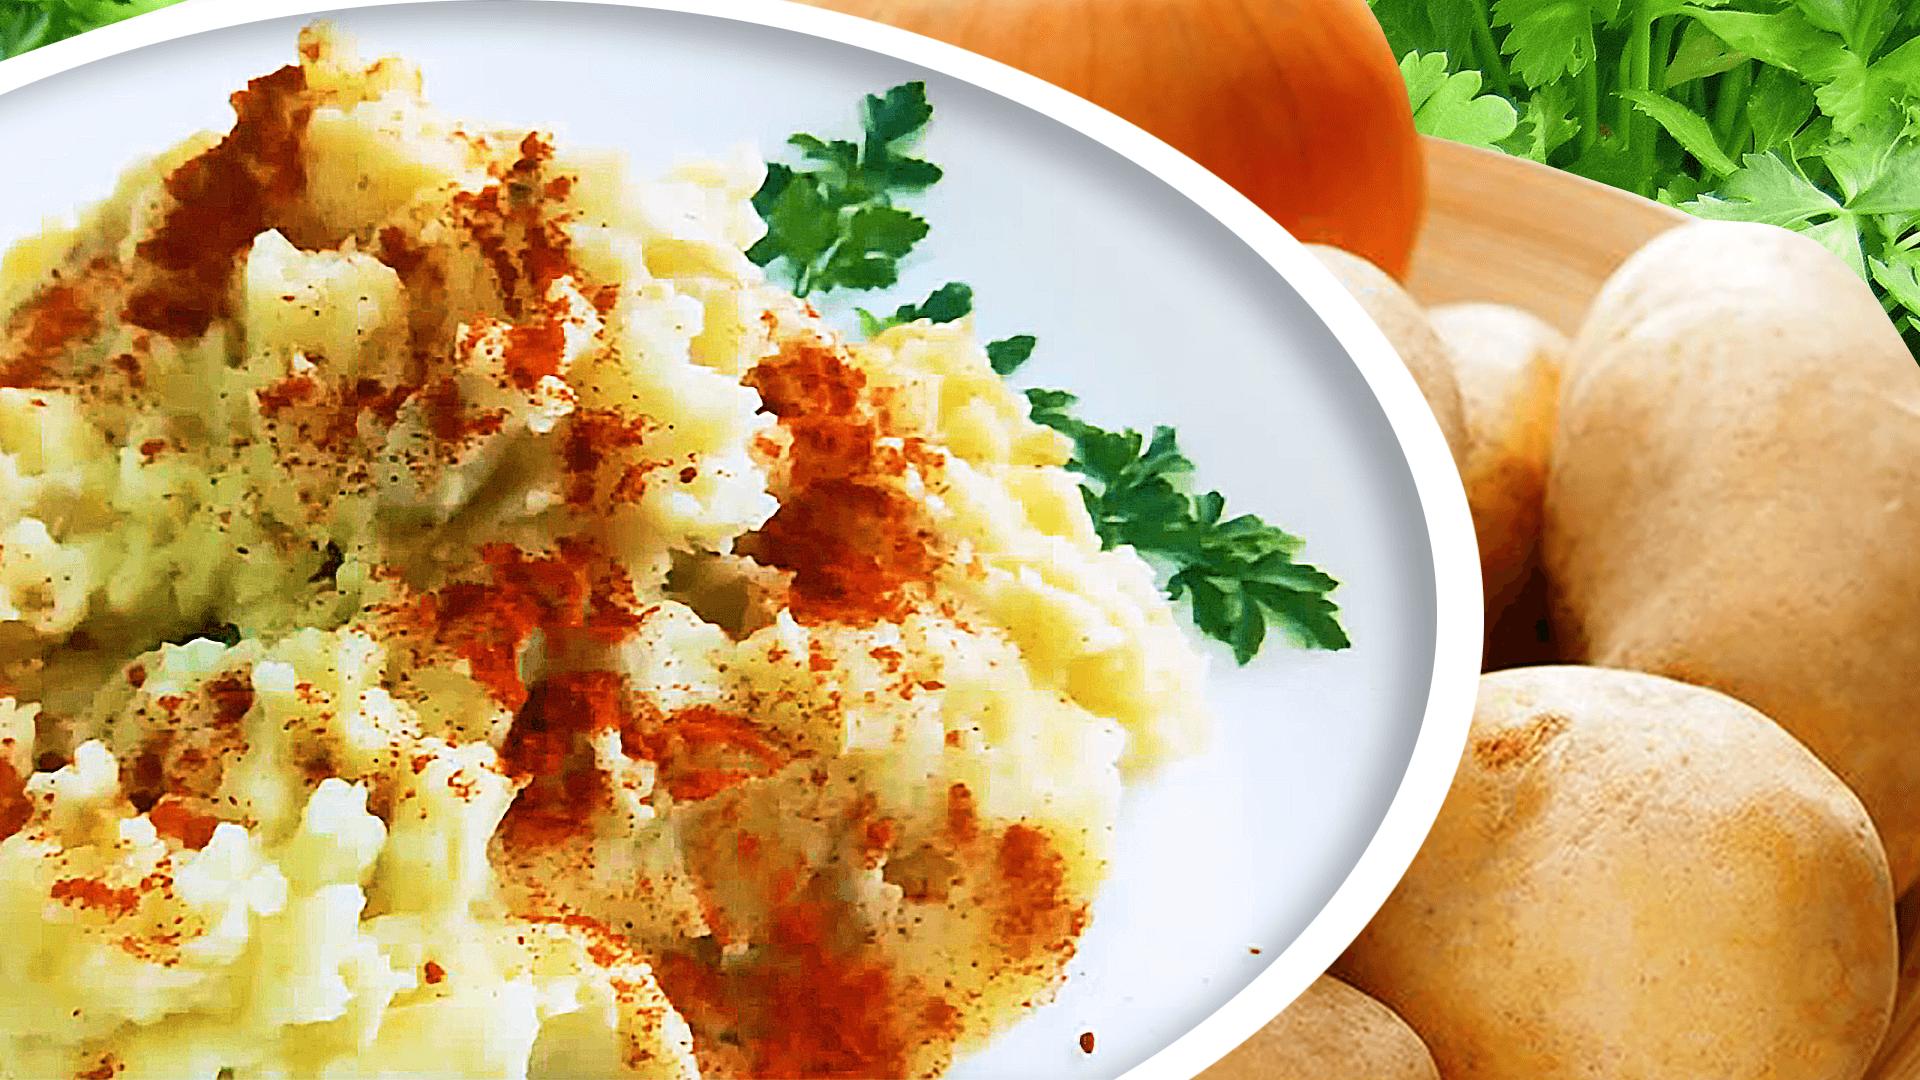 Best Homemade Mashed Potatoes (Making Mashed Potatoes)